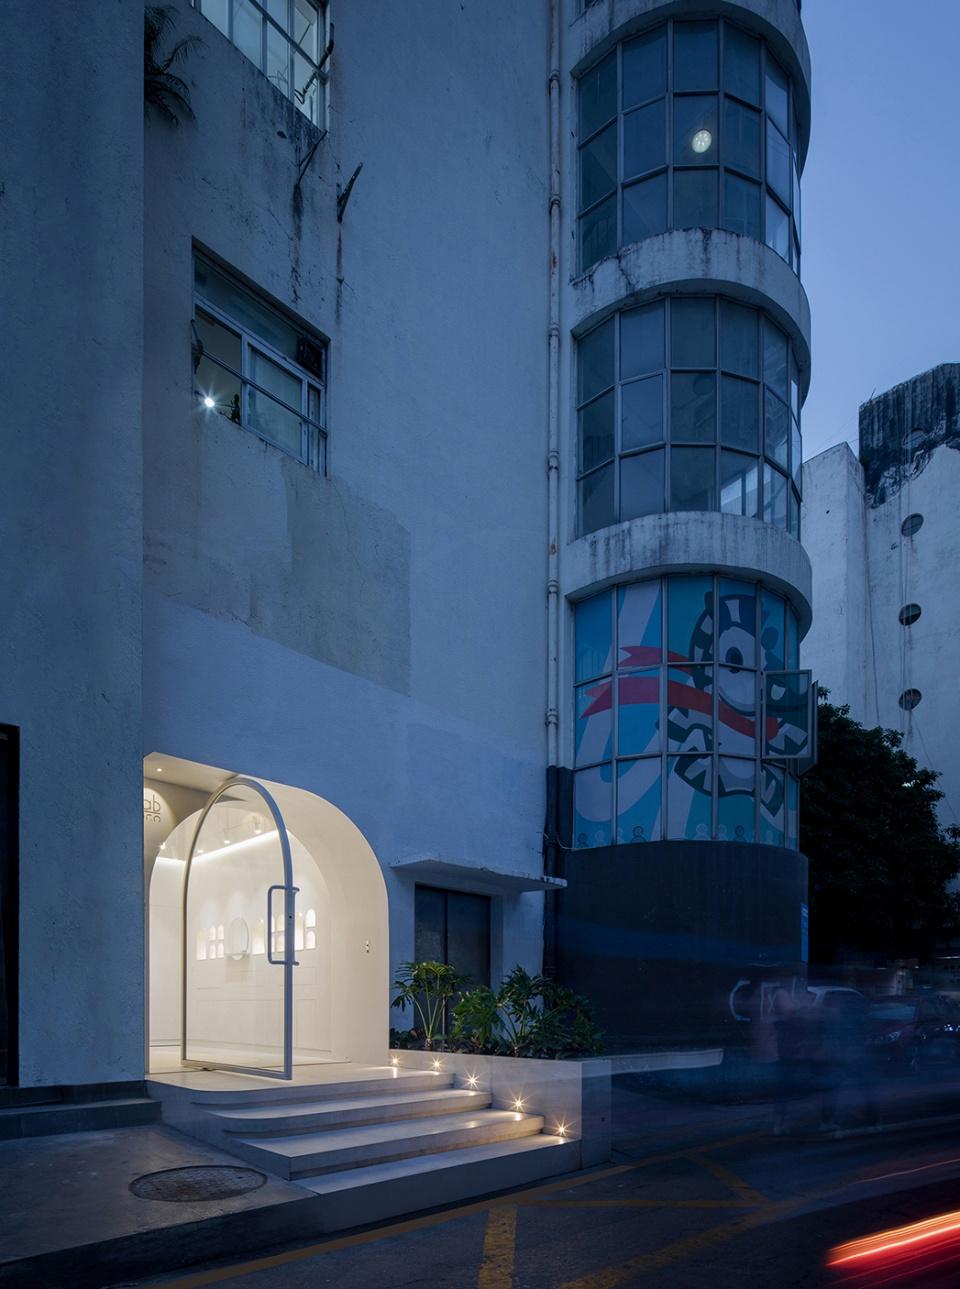 026-lab-oco-china-by-fabersociety-960x1289.jpg